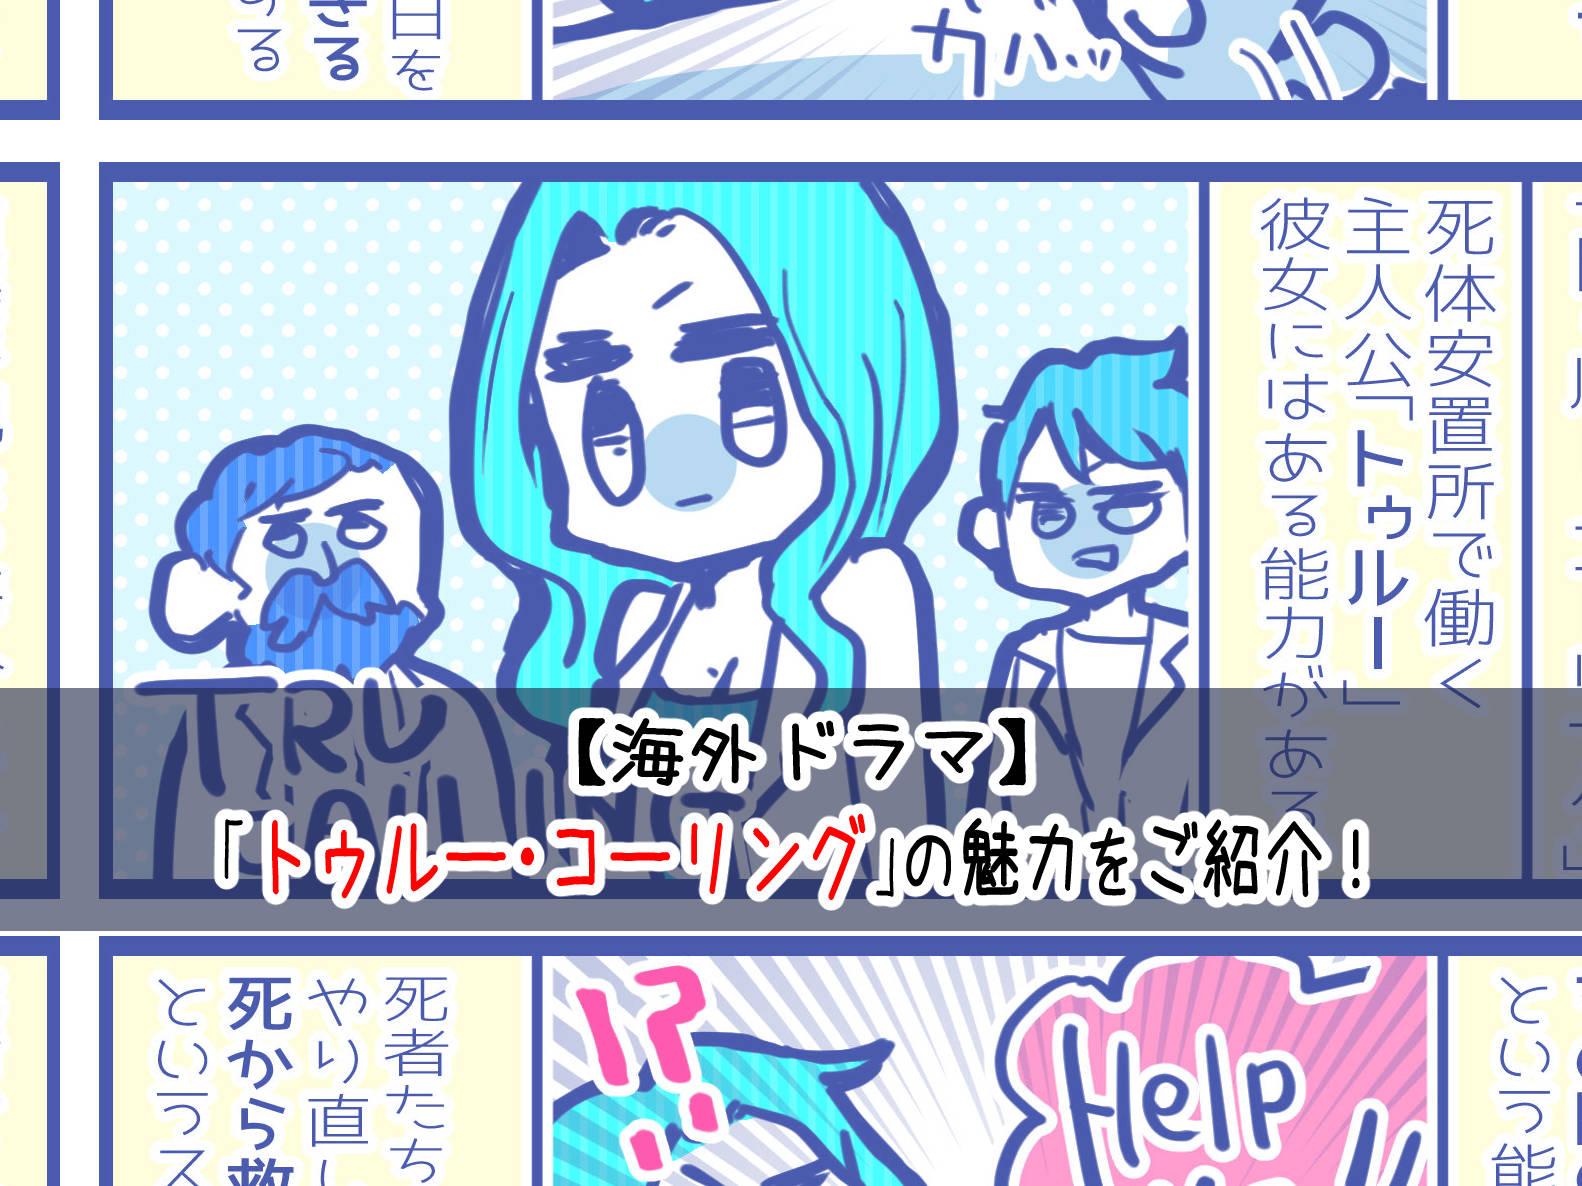 neetsadami.com_23話サムネ